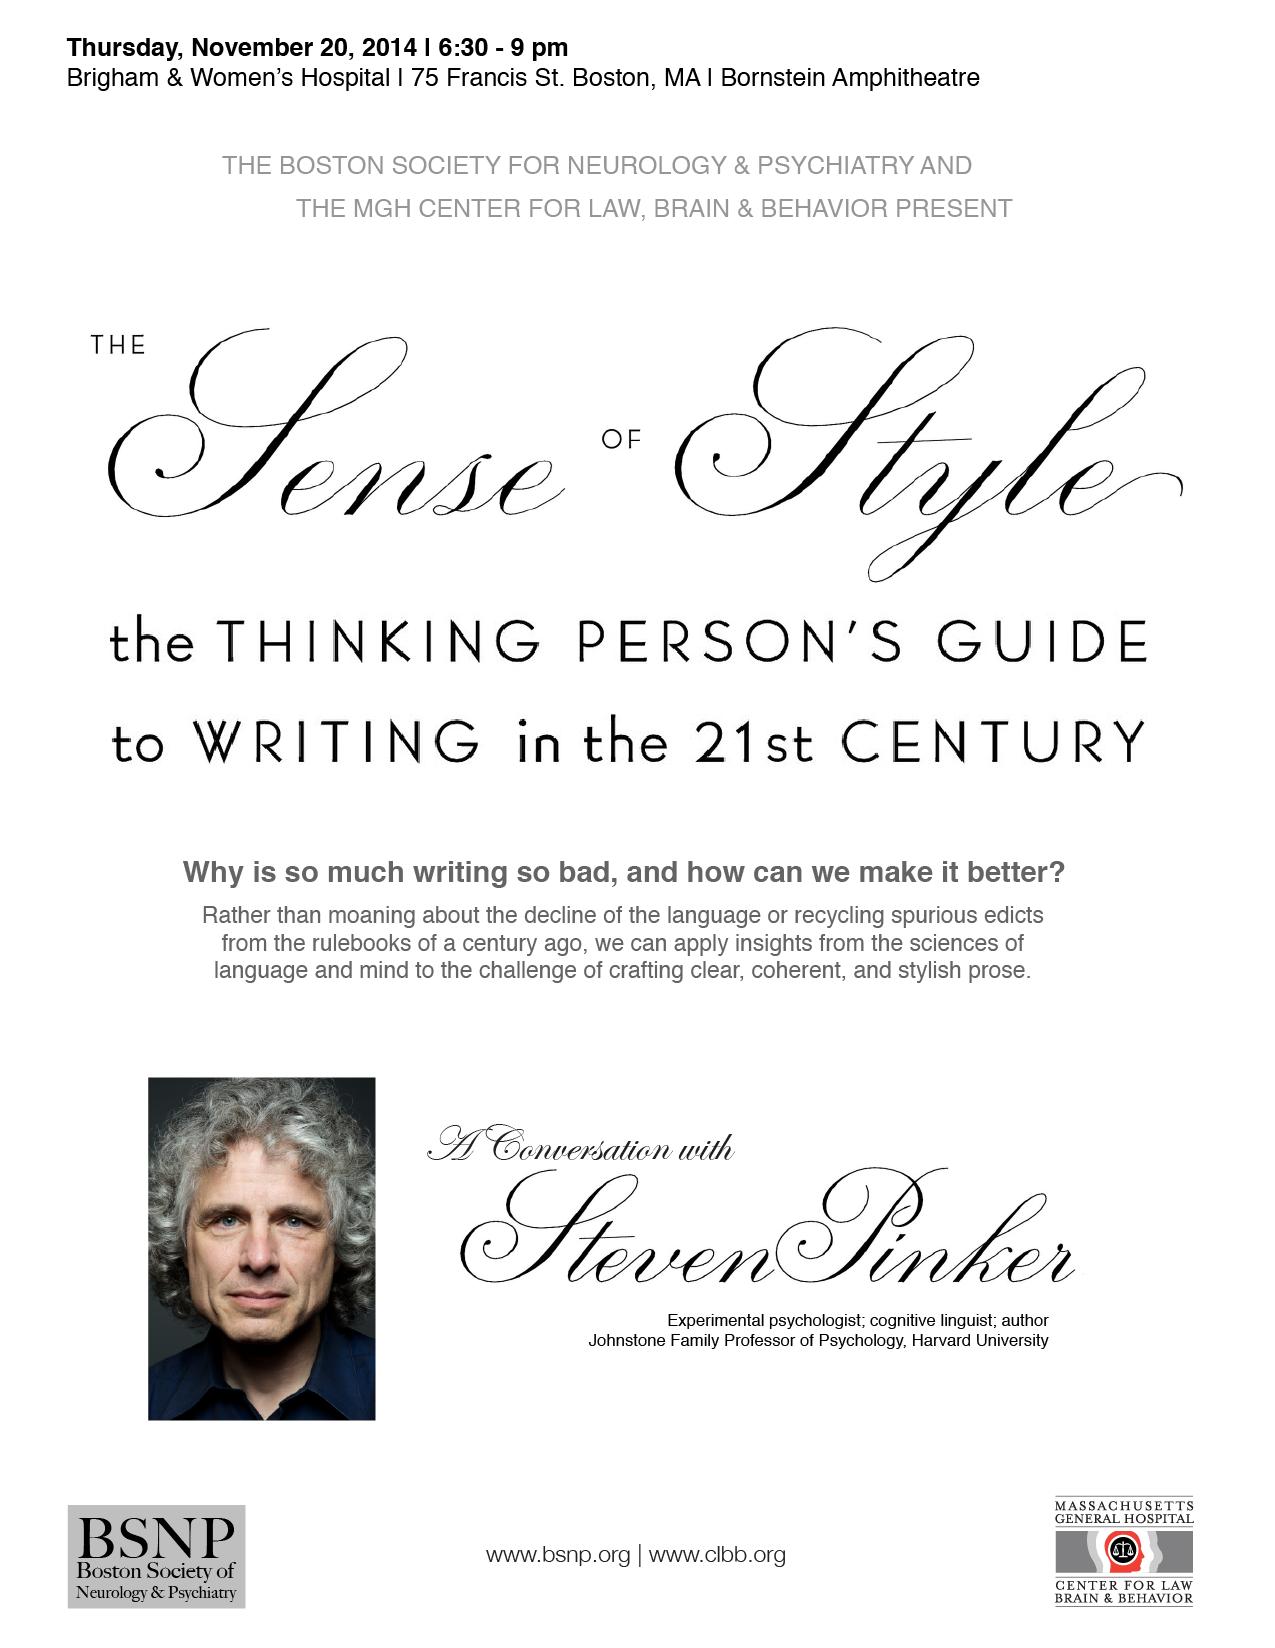 Steven pinker thinking machines essay